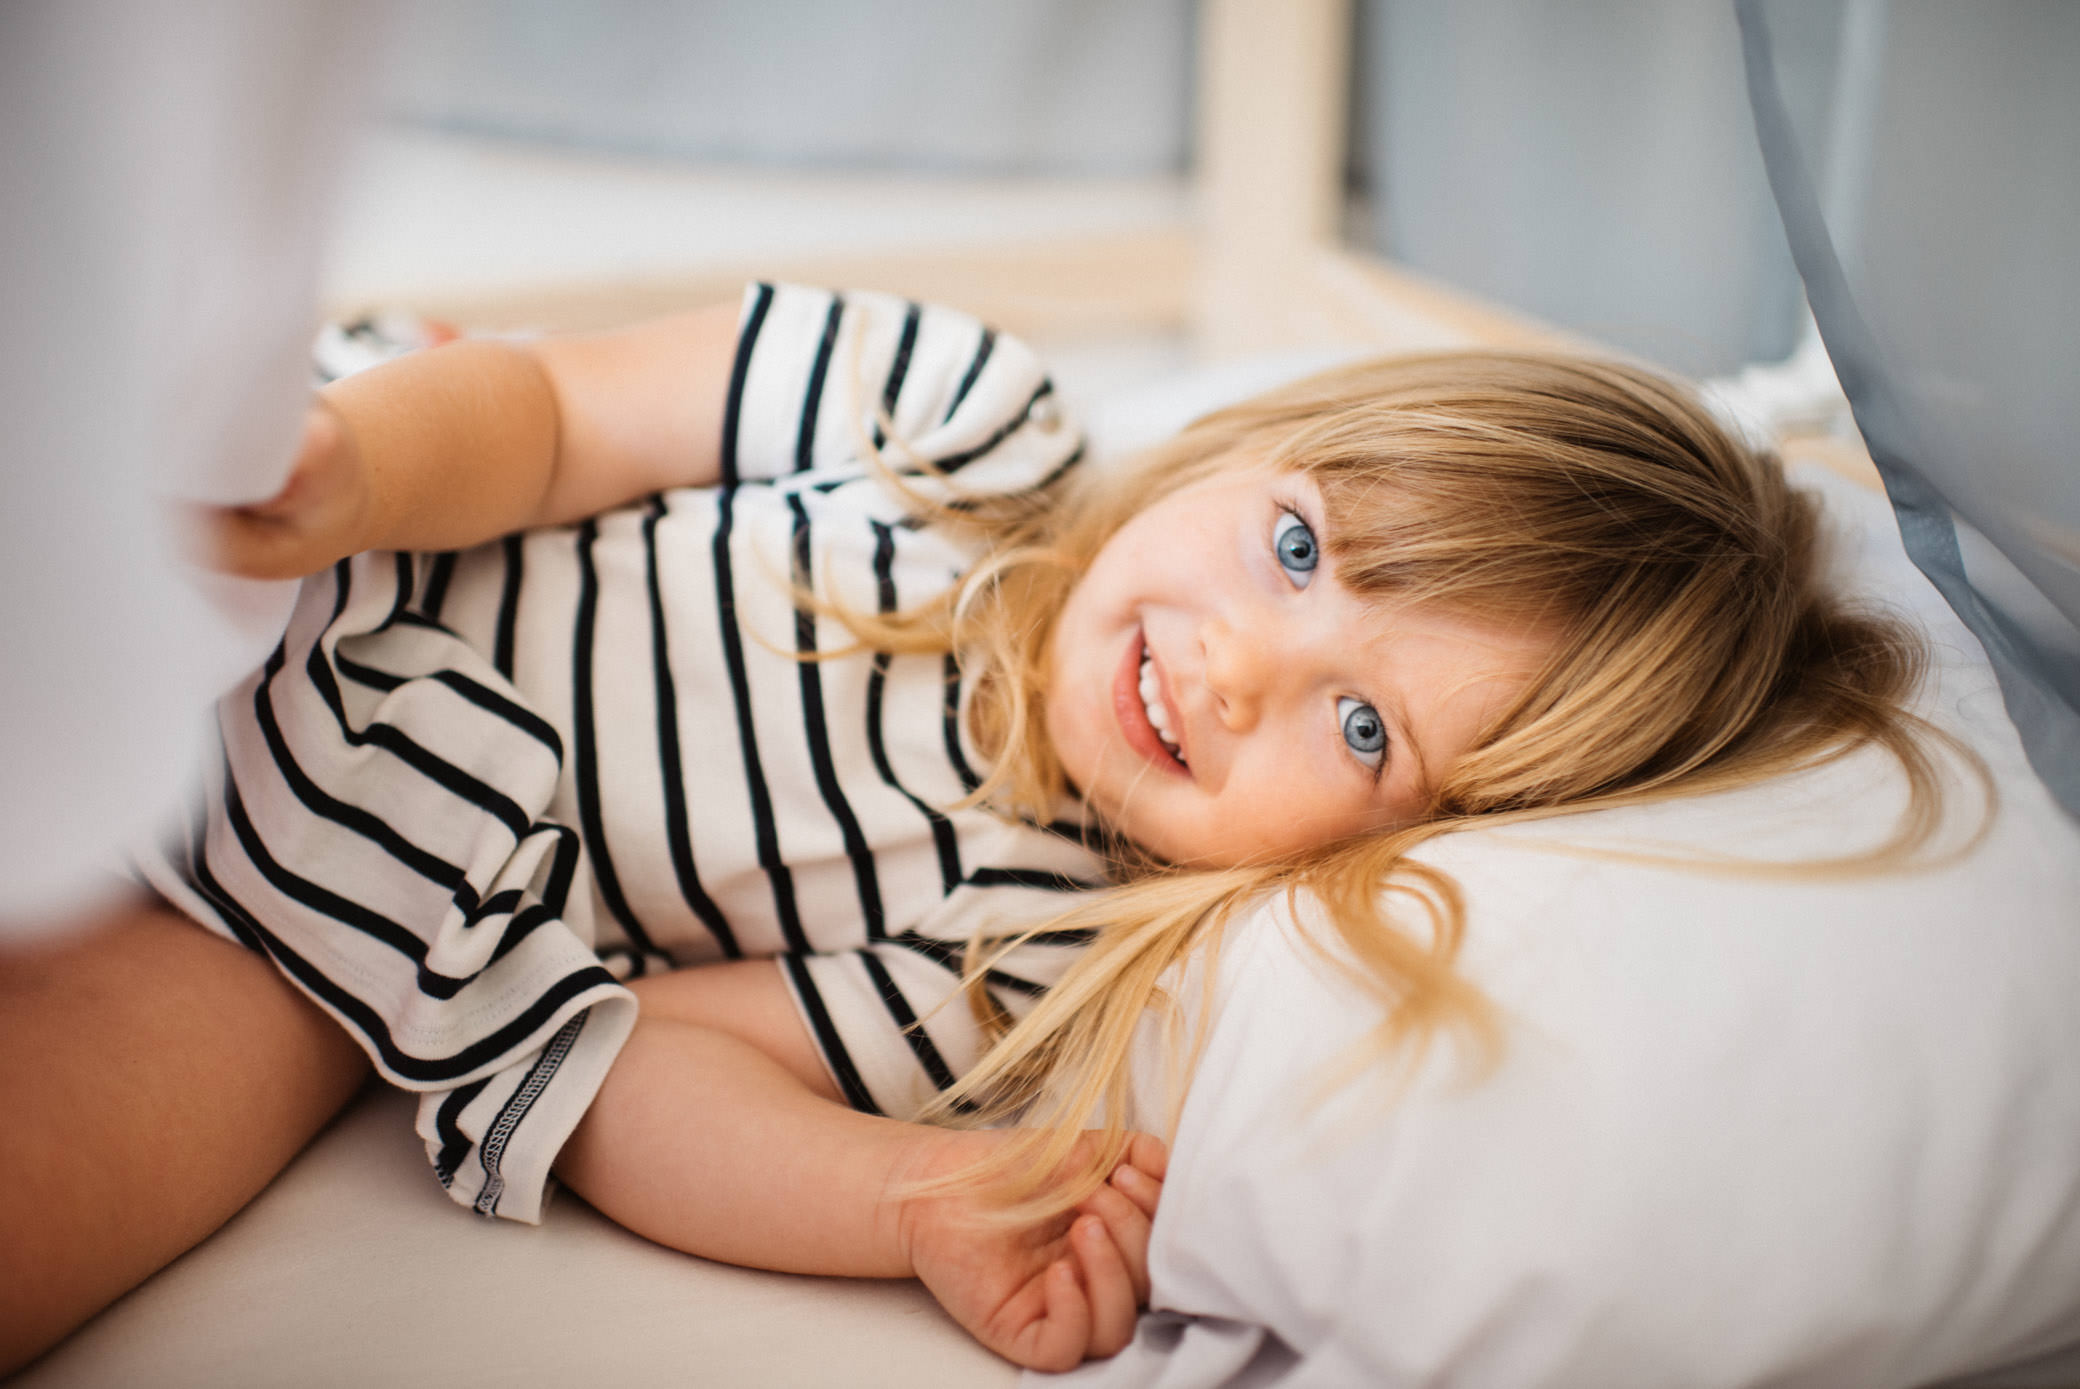 photographe-enfant-aix-en-provence-marseille